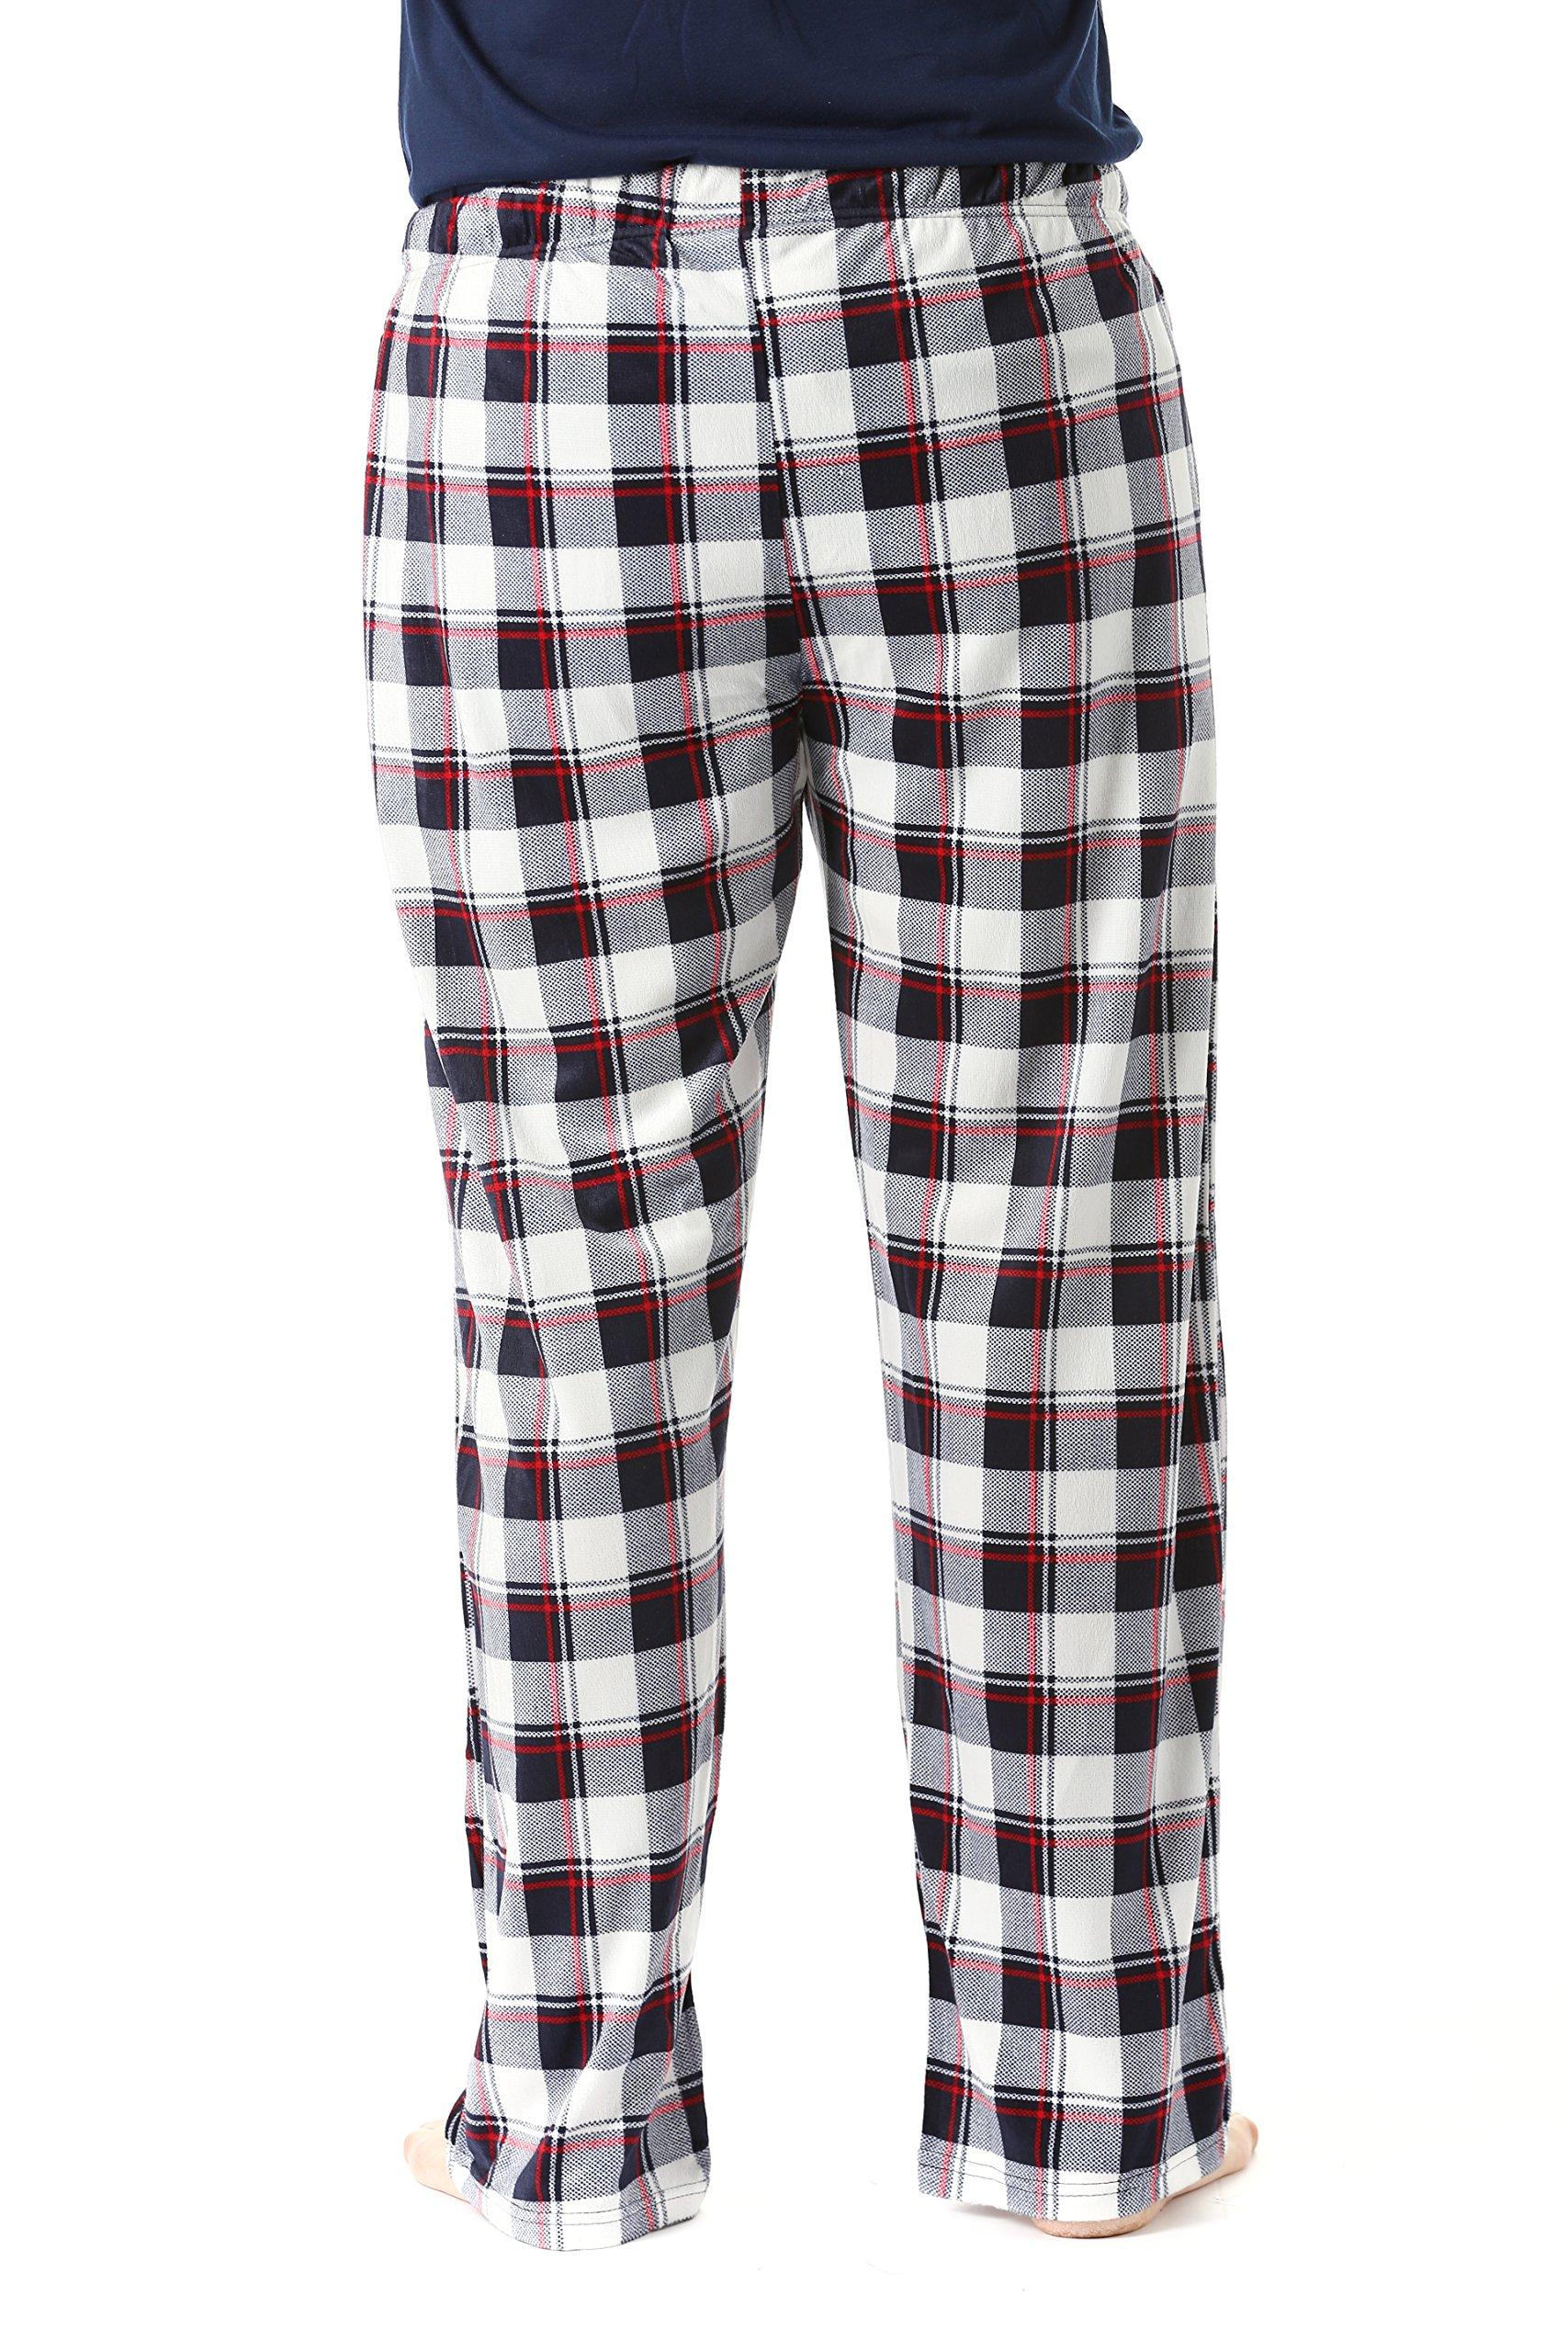 #FollowMe 45903-17-L Fleece Pajama Pants for Men/Sleepwear/PJs,Plaid 17,Large by #followme (Image #3)